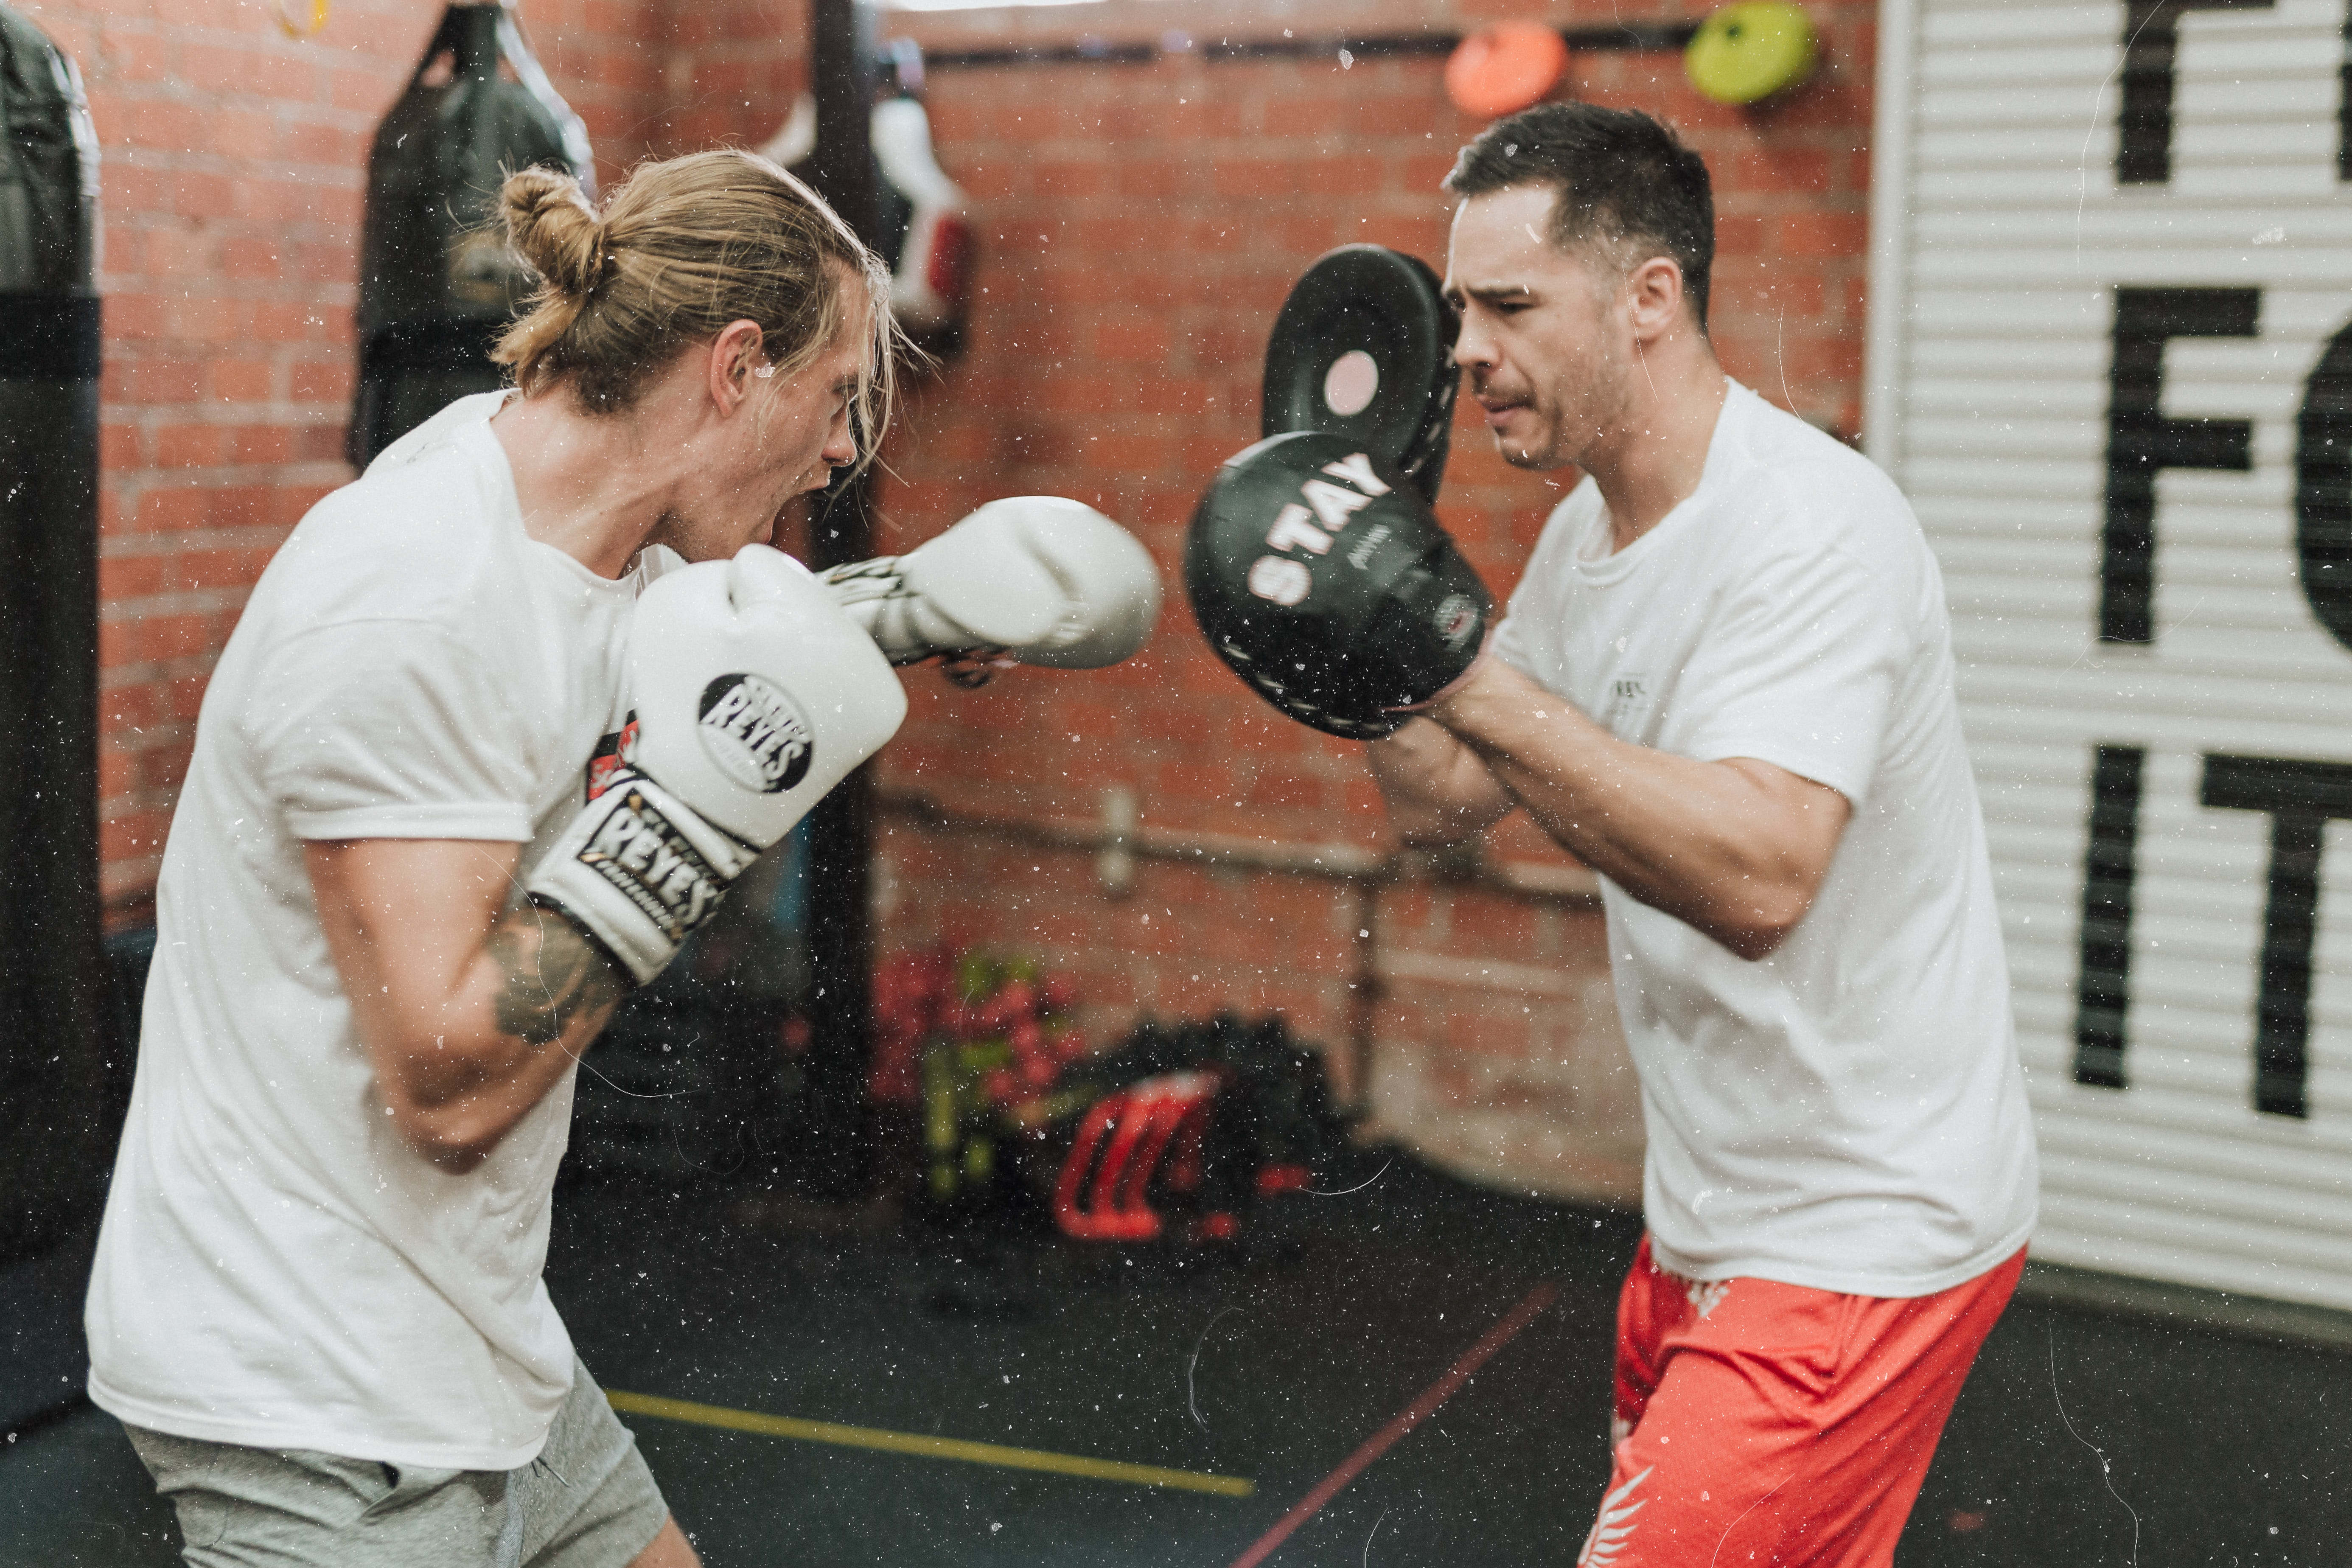 boxing (sparing) - mark-adriane-540728-unsplash